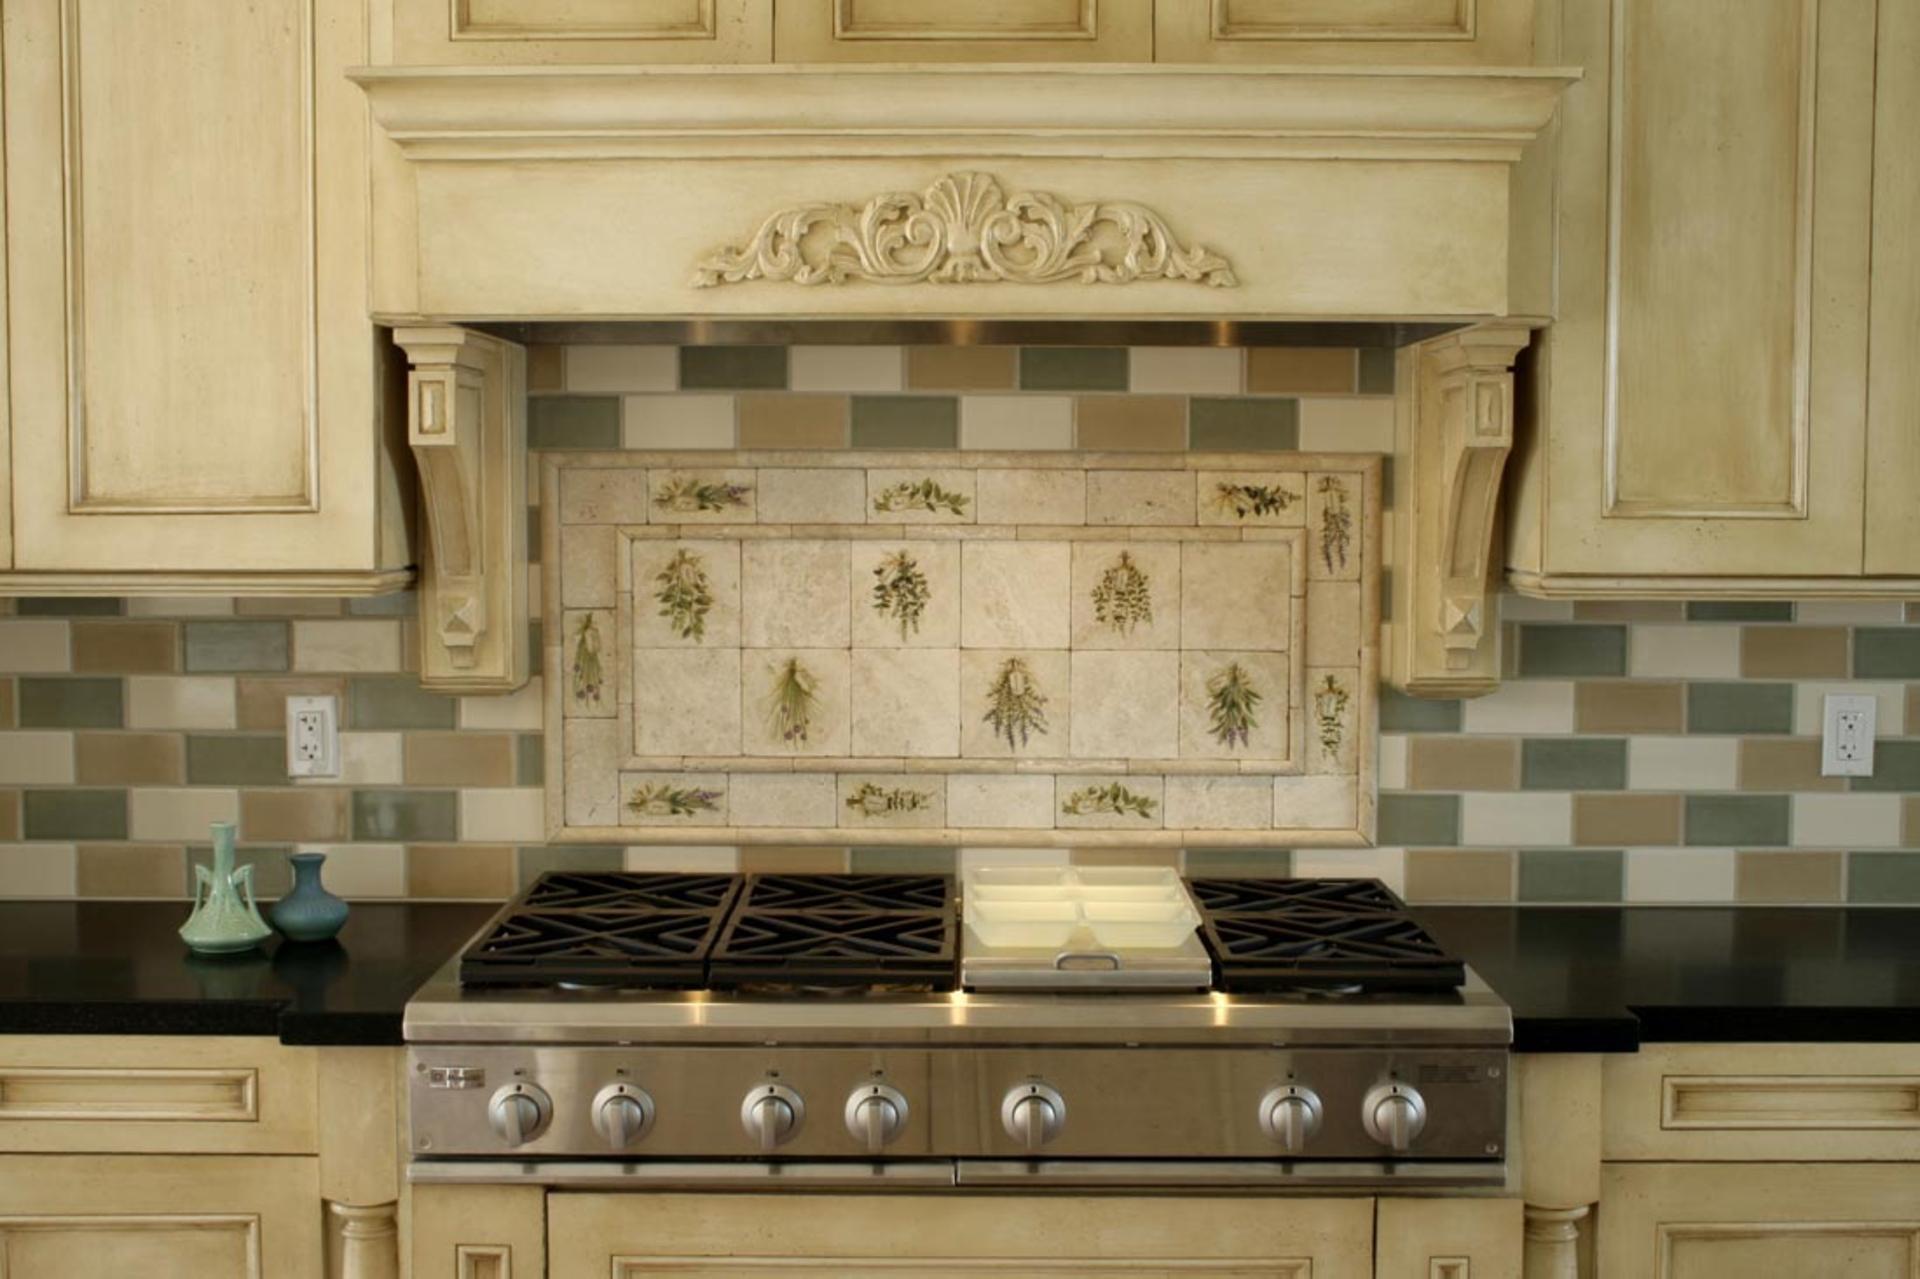 Плитка оливкового цвета в стиле прованс